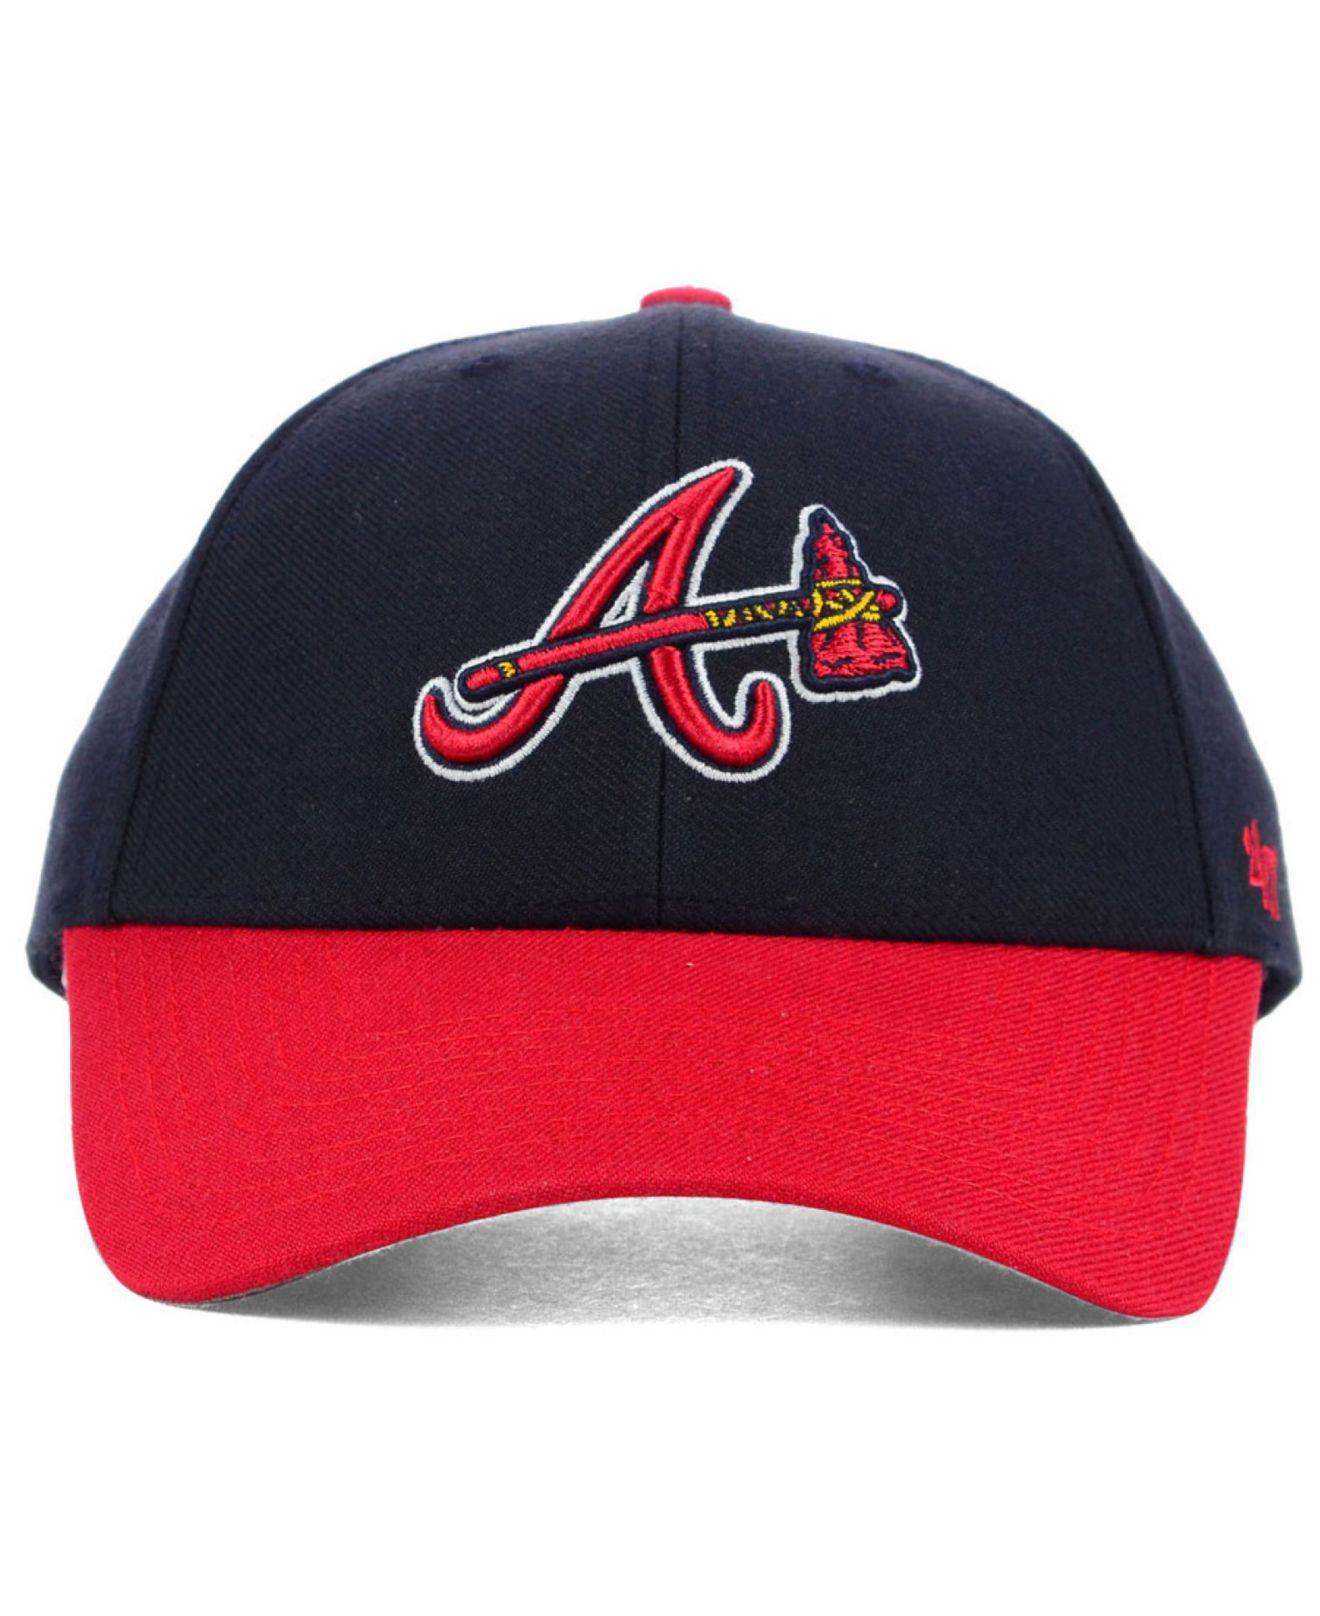 84fec8c09fc Lyst - 47 Brand Atlanta Braves Mvp Curved Cap in Blue for Men